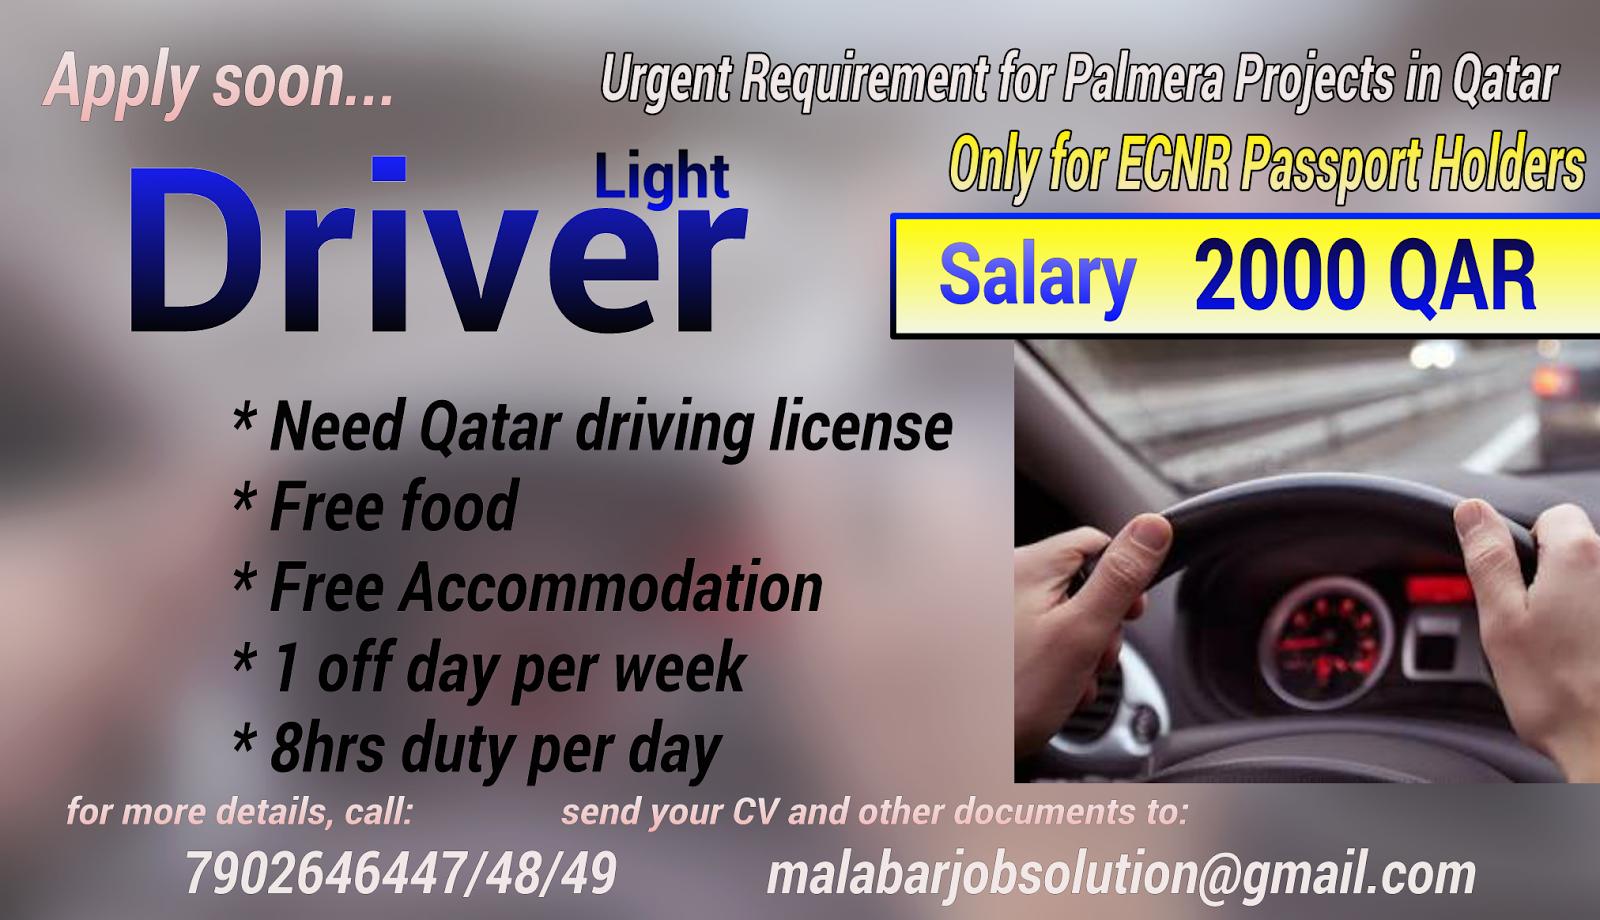 Malabar job solution: light driver for qatar